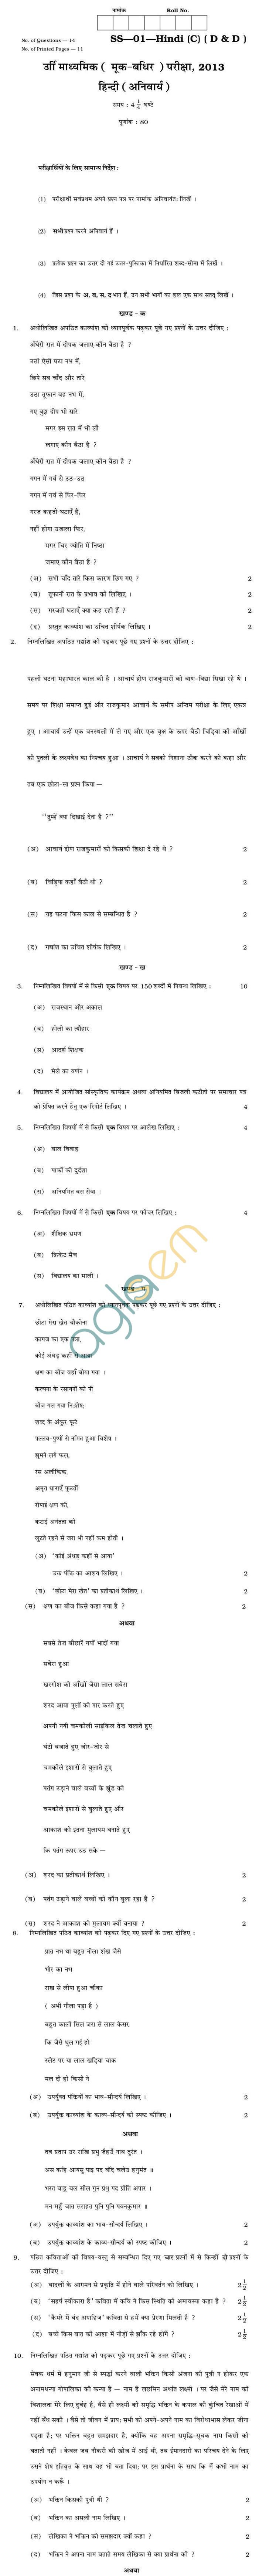 Rajasthan Board Sr. Secondary Hindi (C) (DD) Question Paper 2013